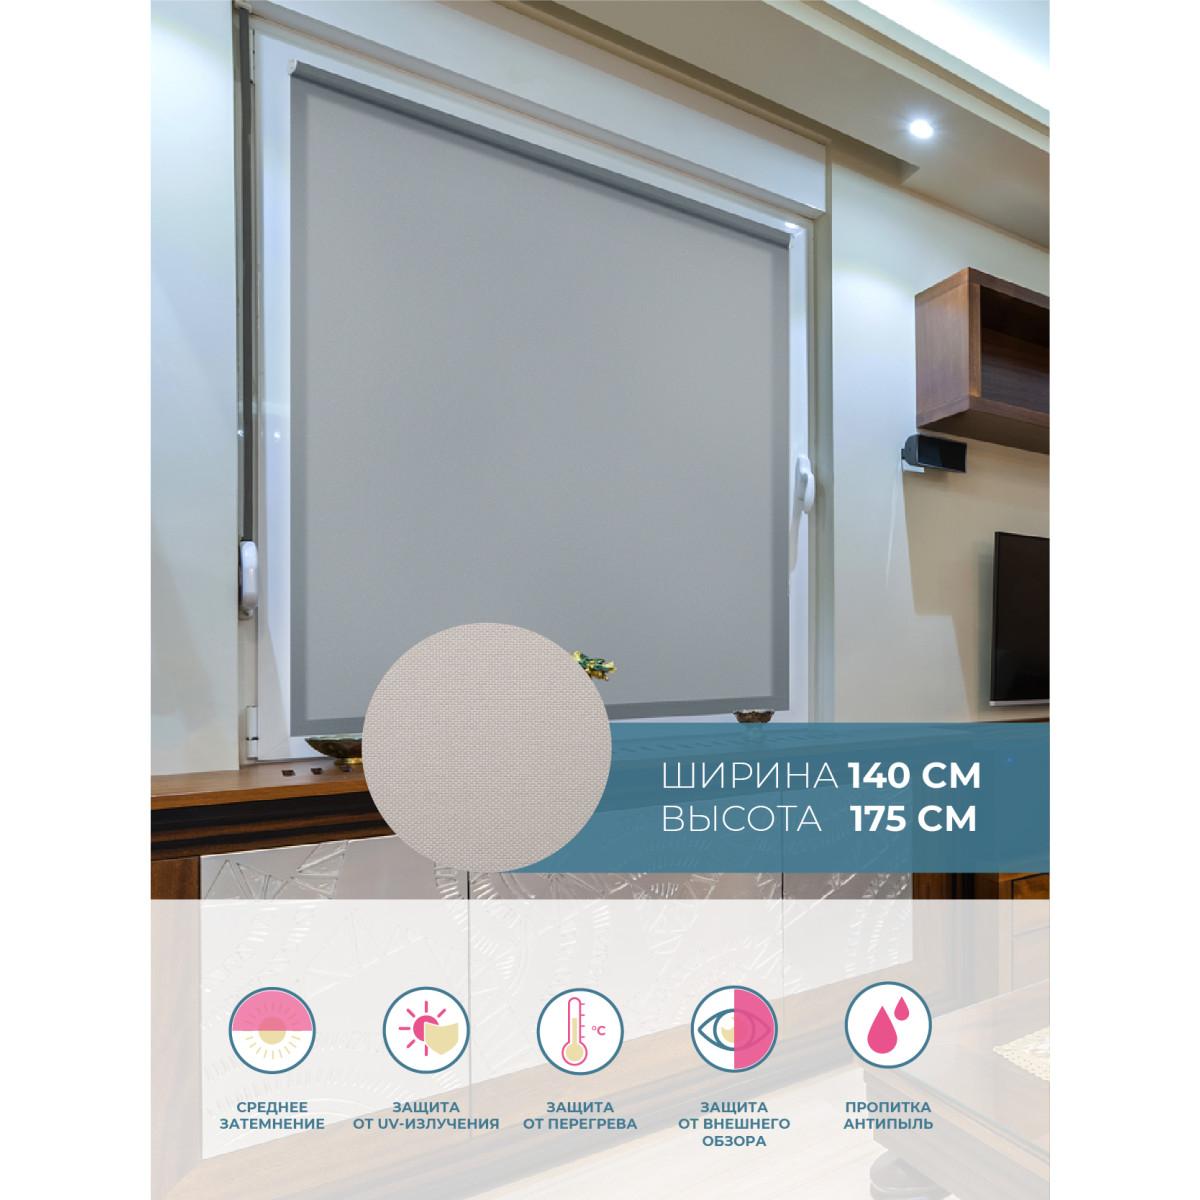 Рулонная Ора Decofest Плайн 140Х175 Цвет Серый